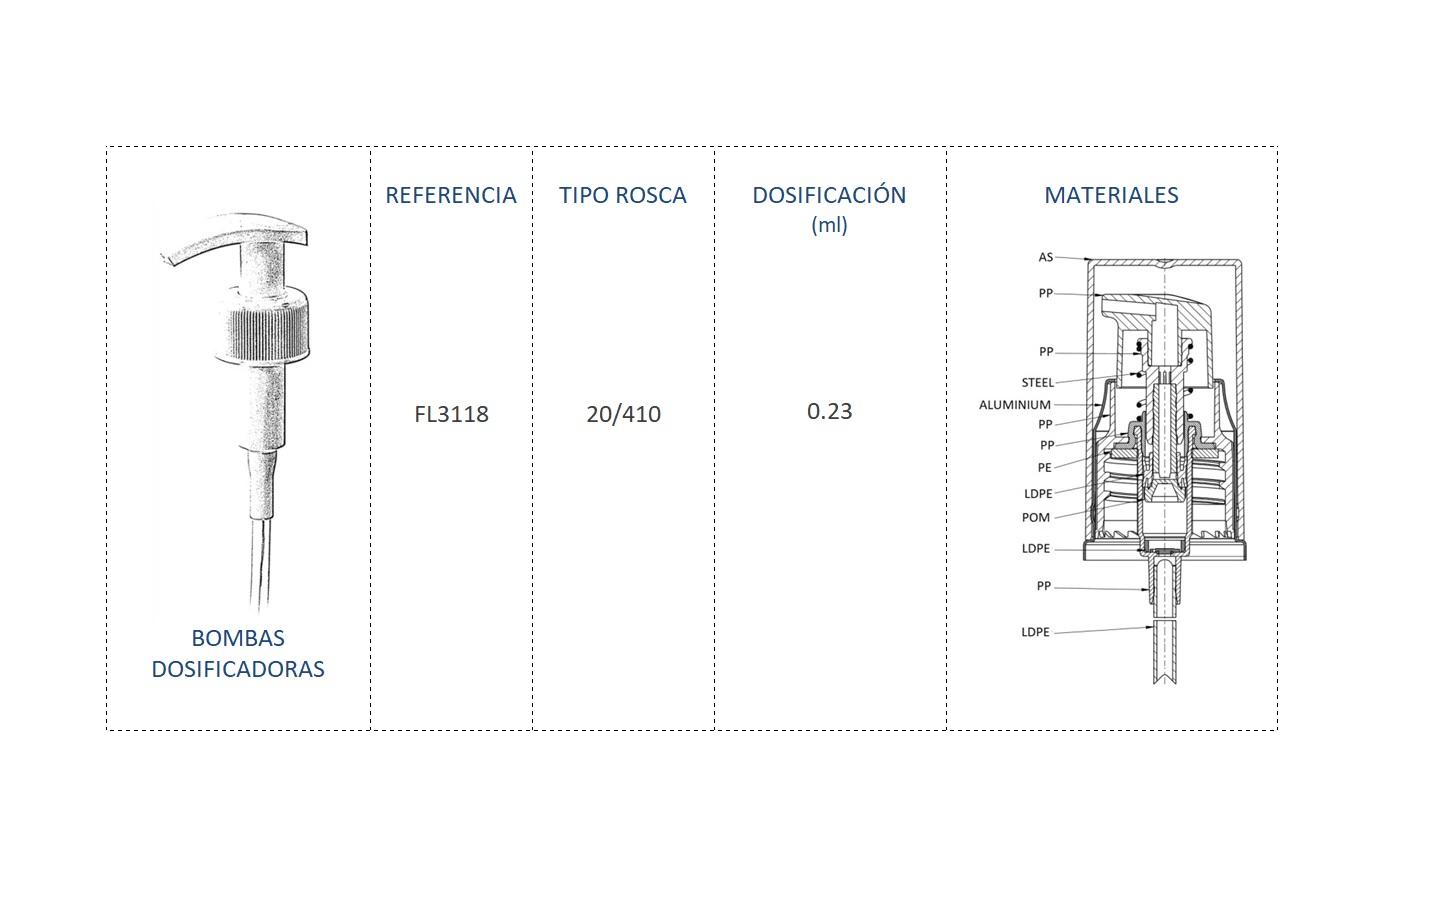 Cuadro de materiales bomba dosificadora FL3118 20-410